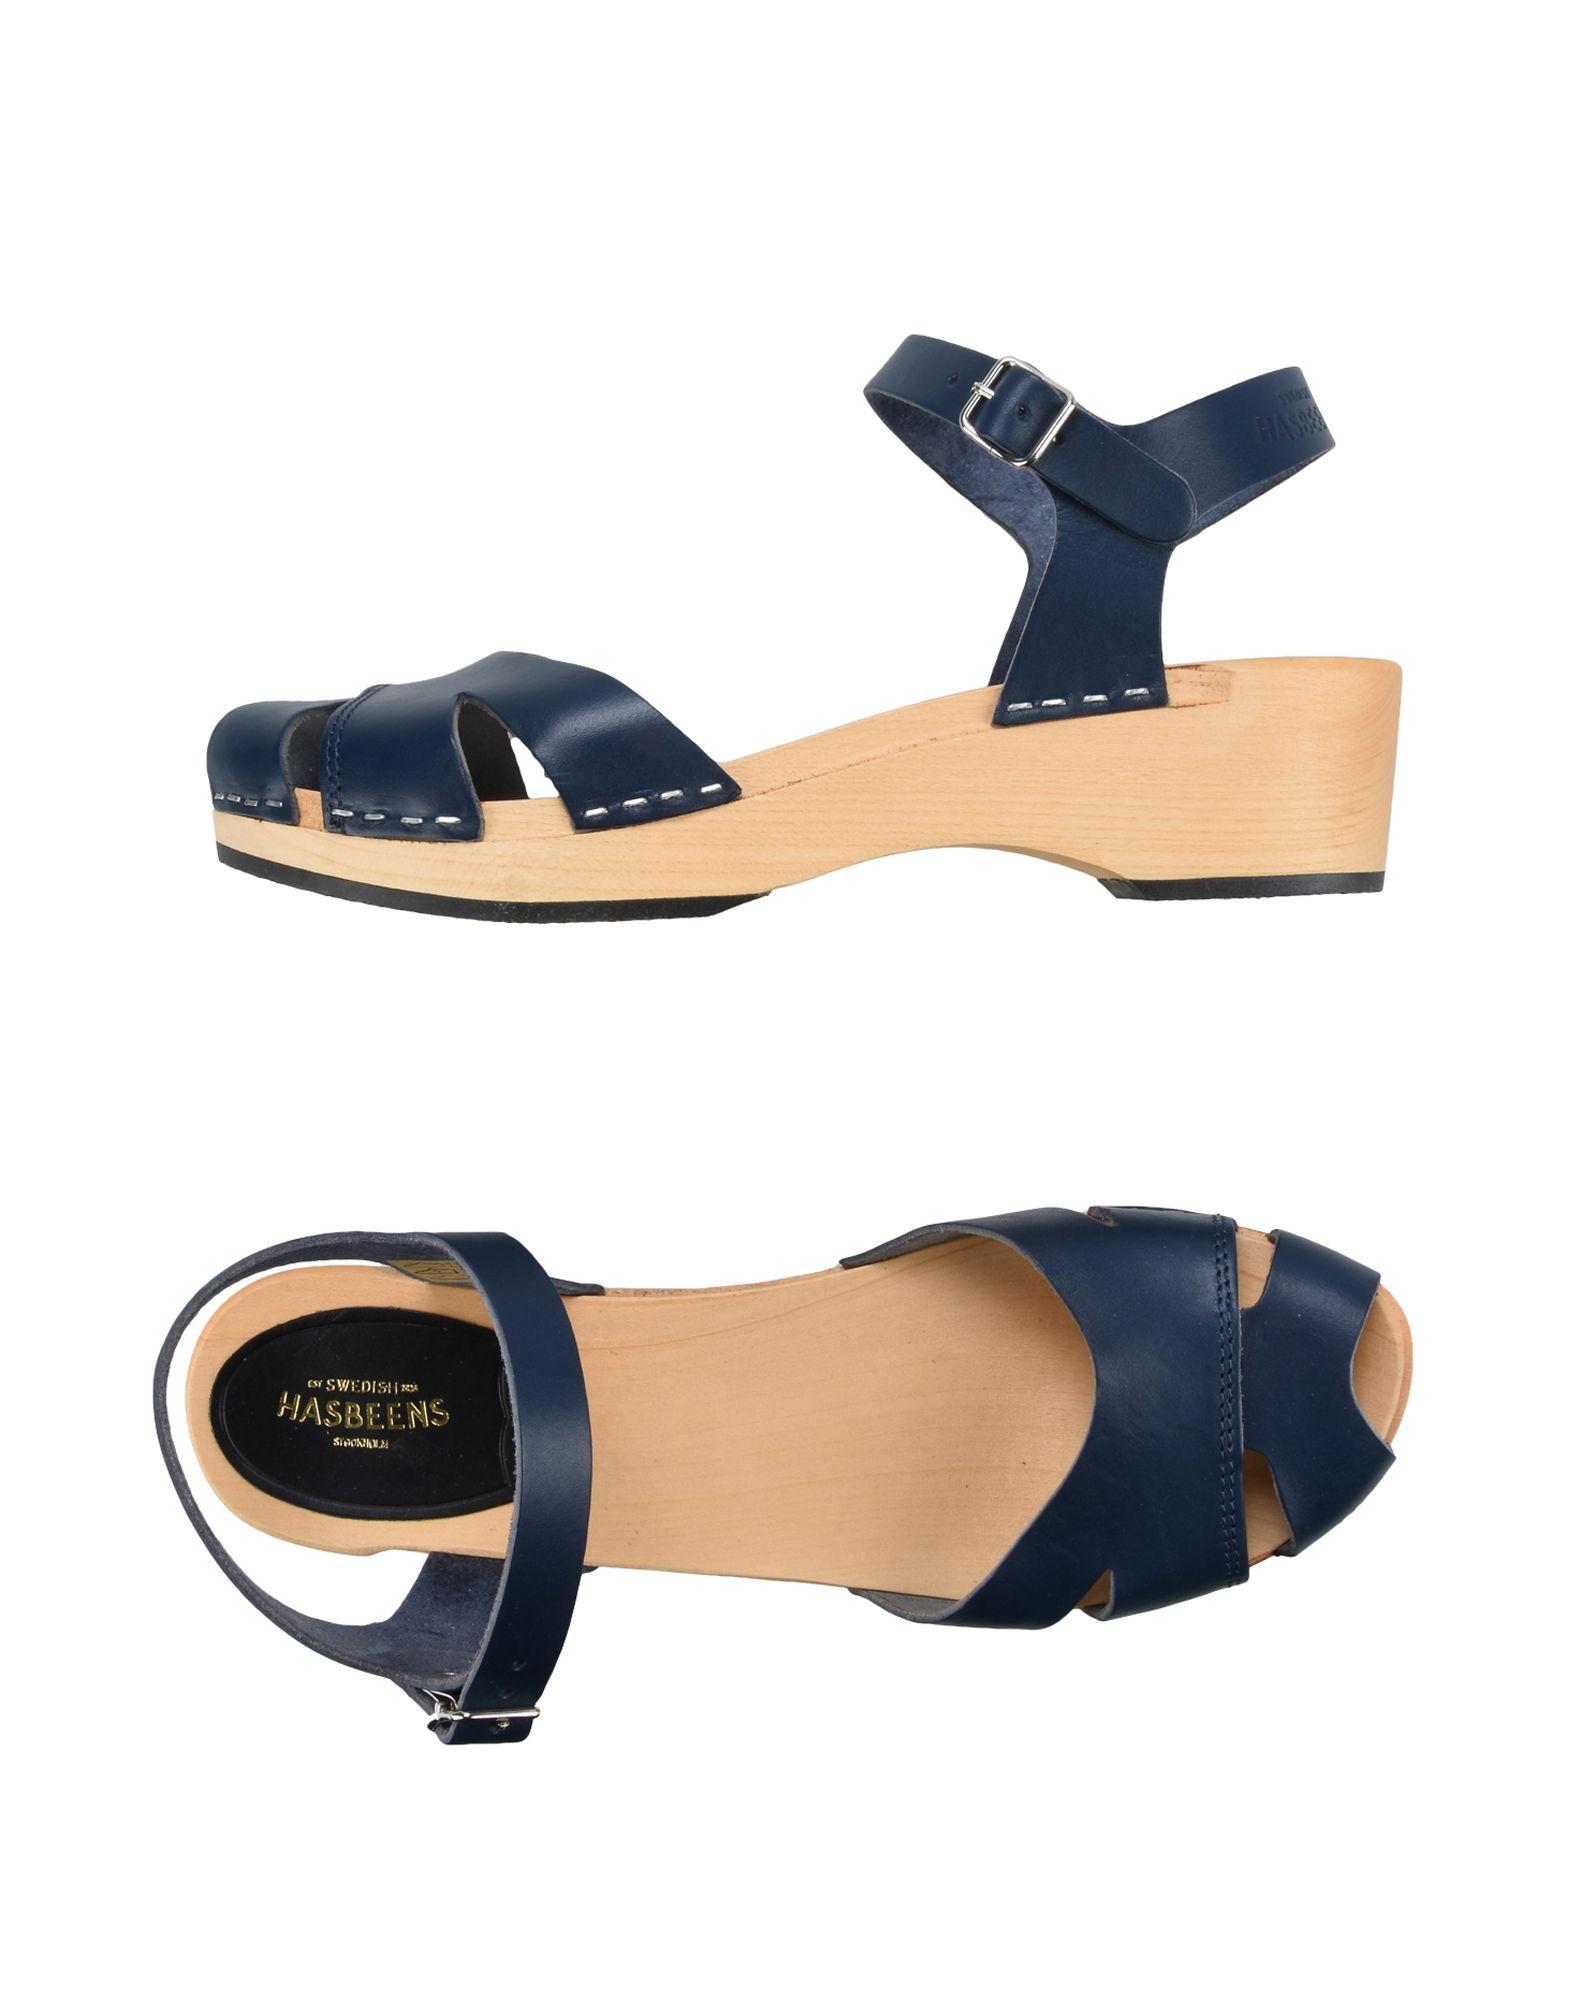 SWEDISH HASBEENS Sandals in Dark Blue